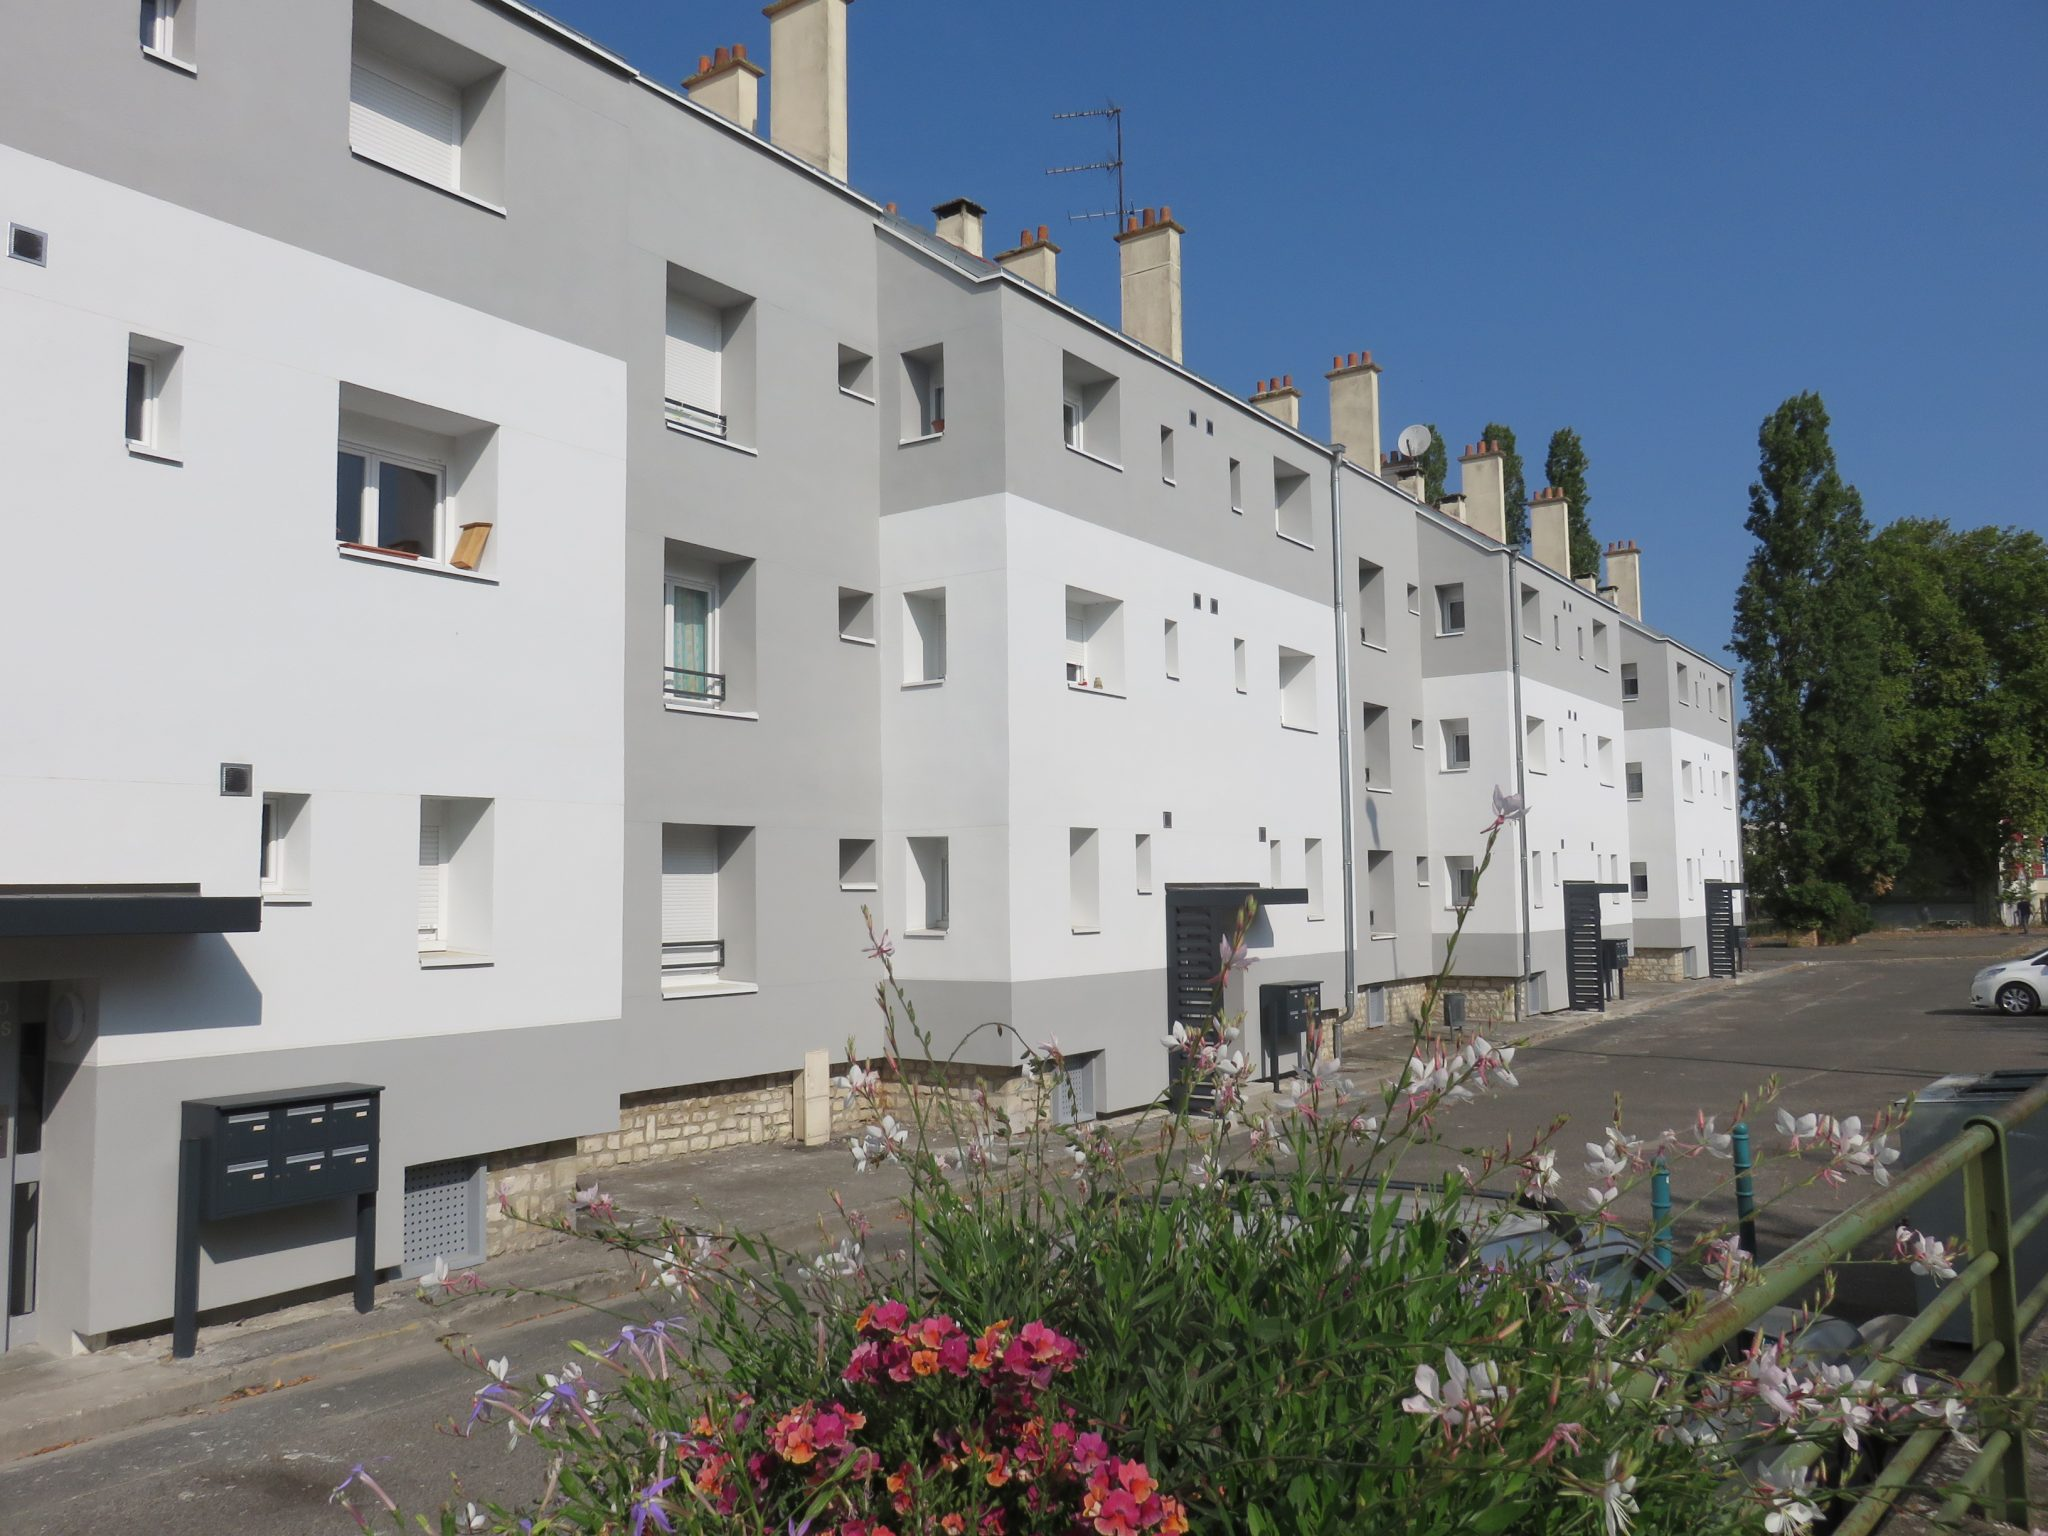 BIS RUE DU GENERAL BINOT, RUE DU GENERAL BINOT, Cosne-sur-Loire, 58200, Appartement, Patrimoine 1776